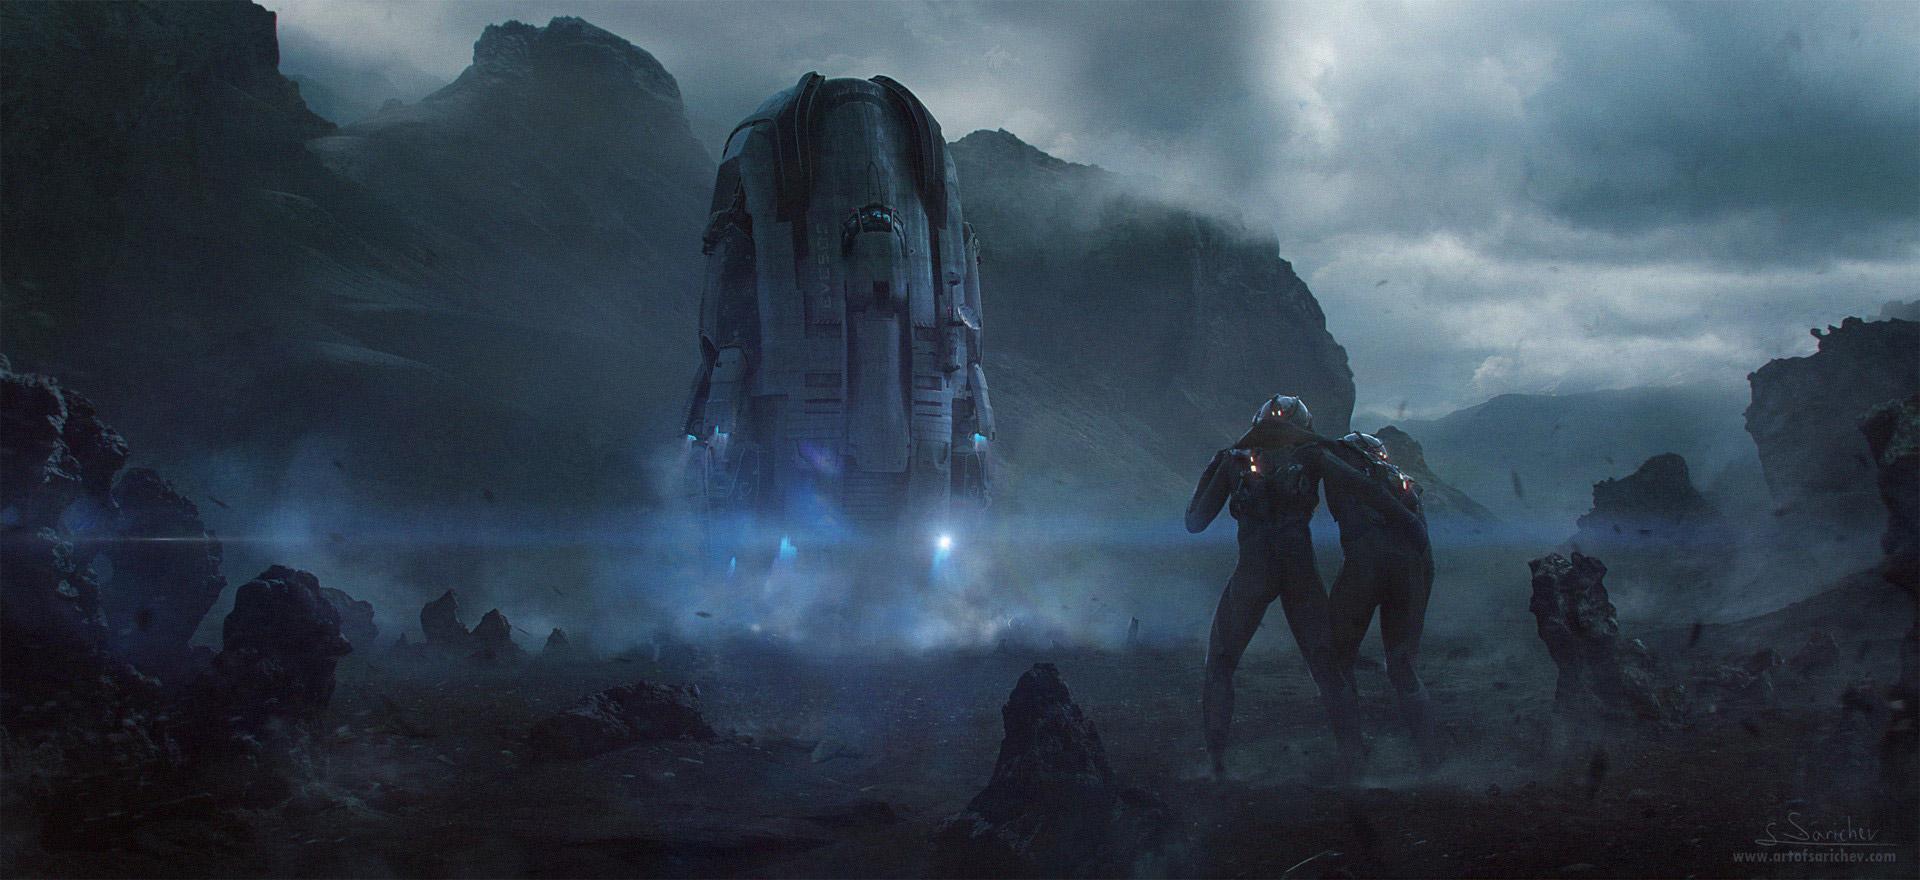 The Science Fiction Art of Sergei Sarichev